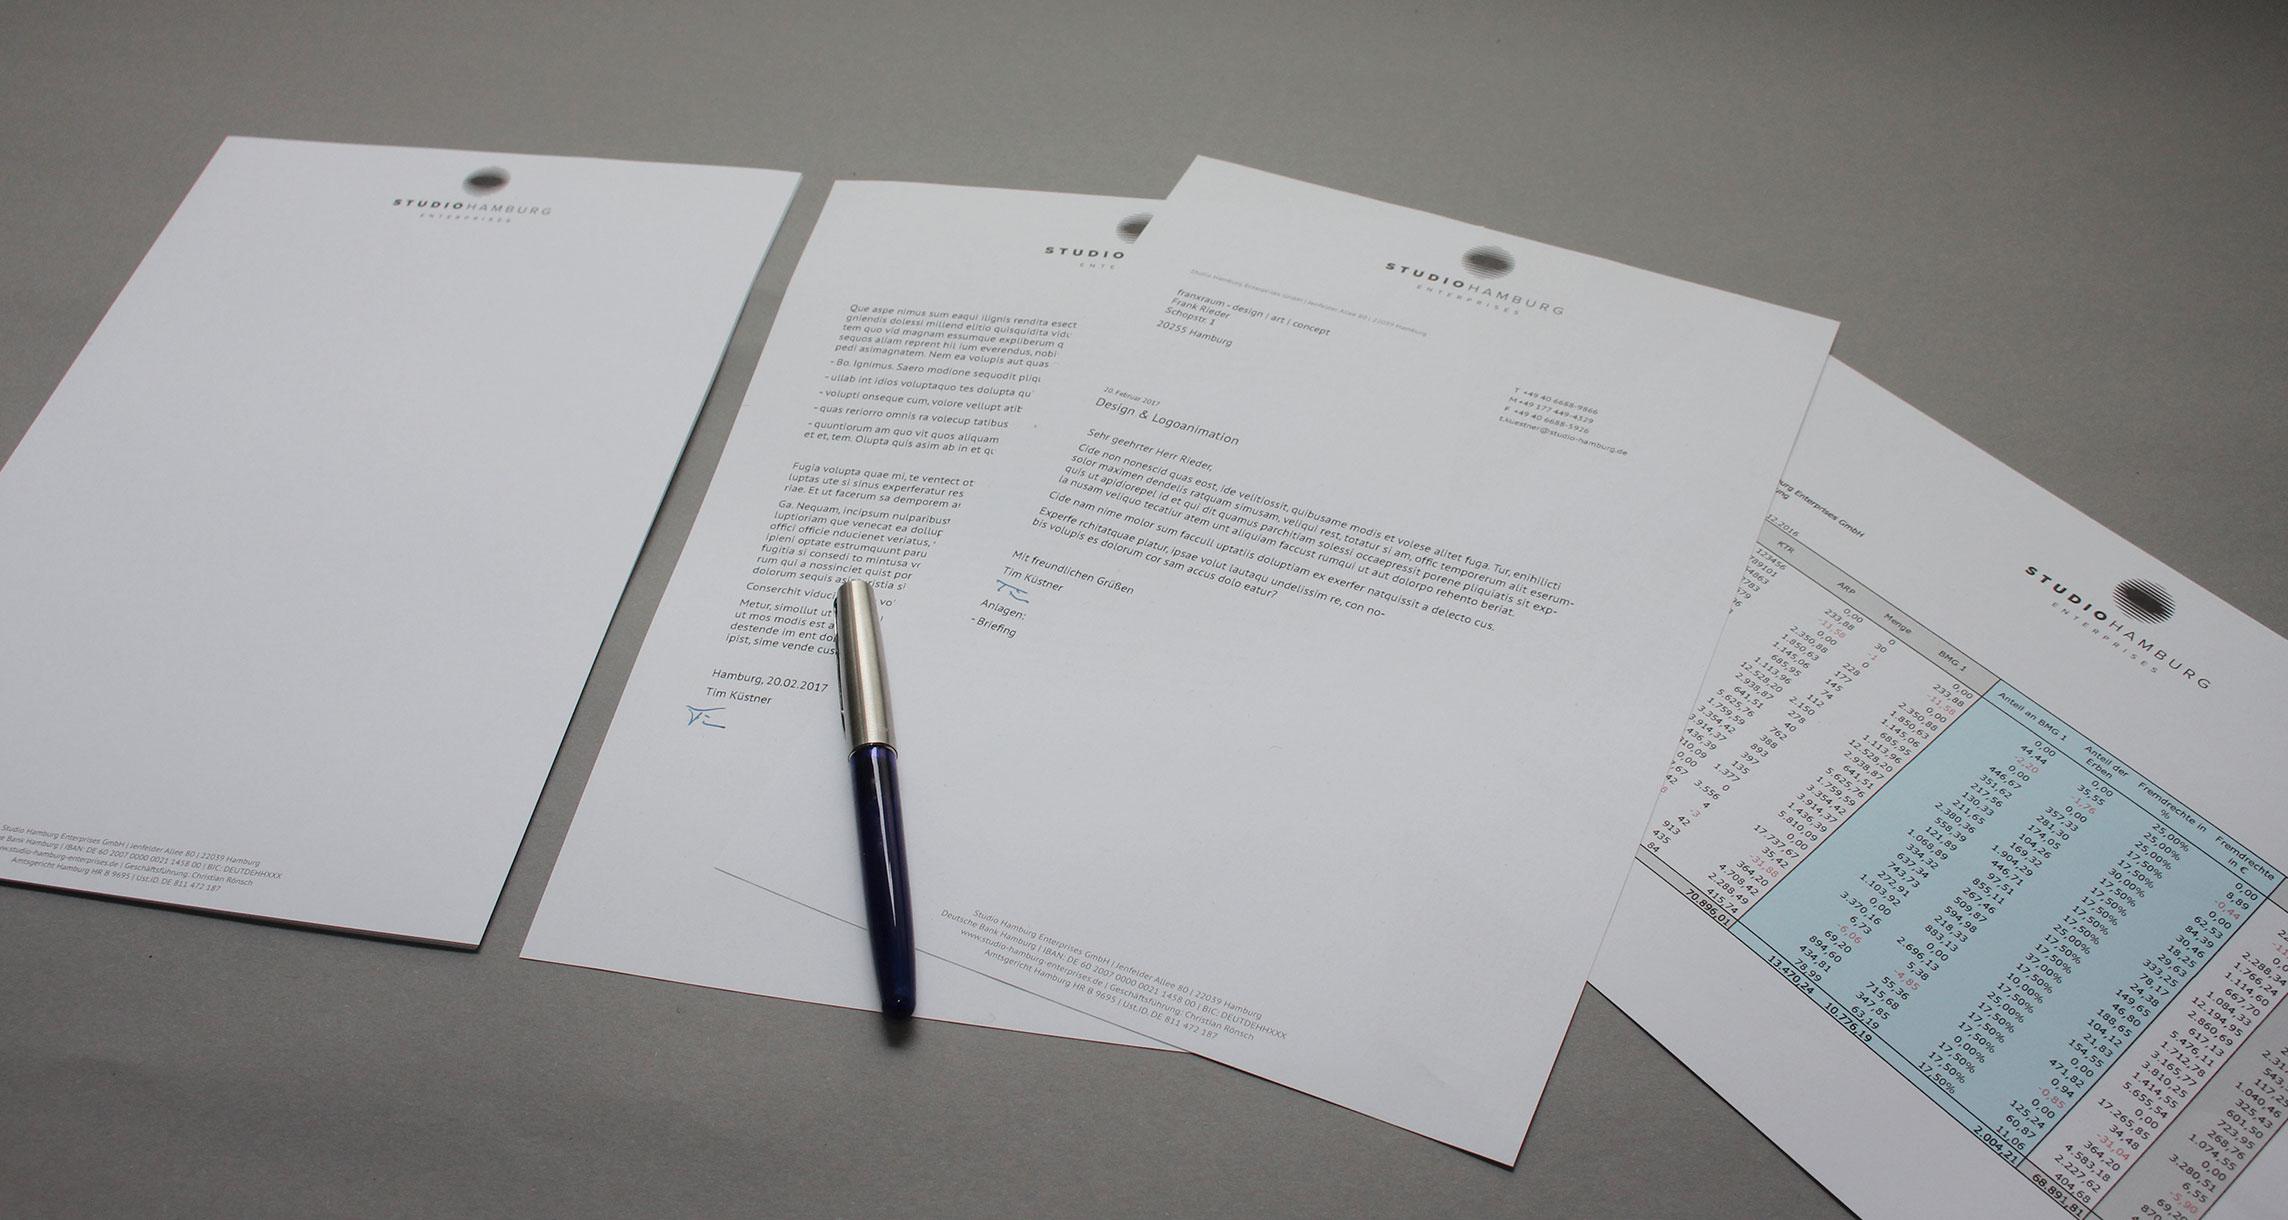 Geschäftsausstattung Studio Hamburg Enterprises: Briefpapier